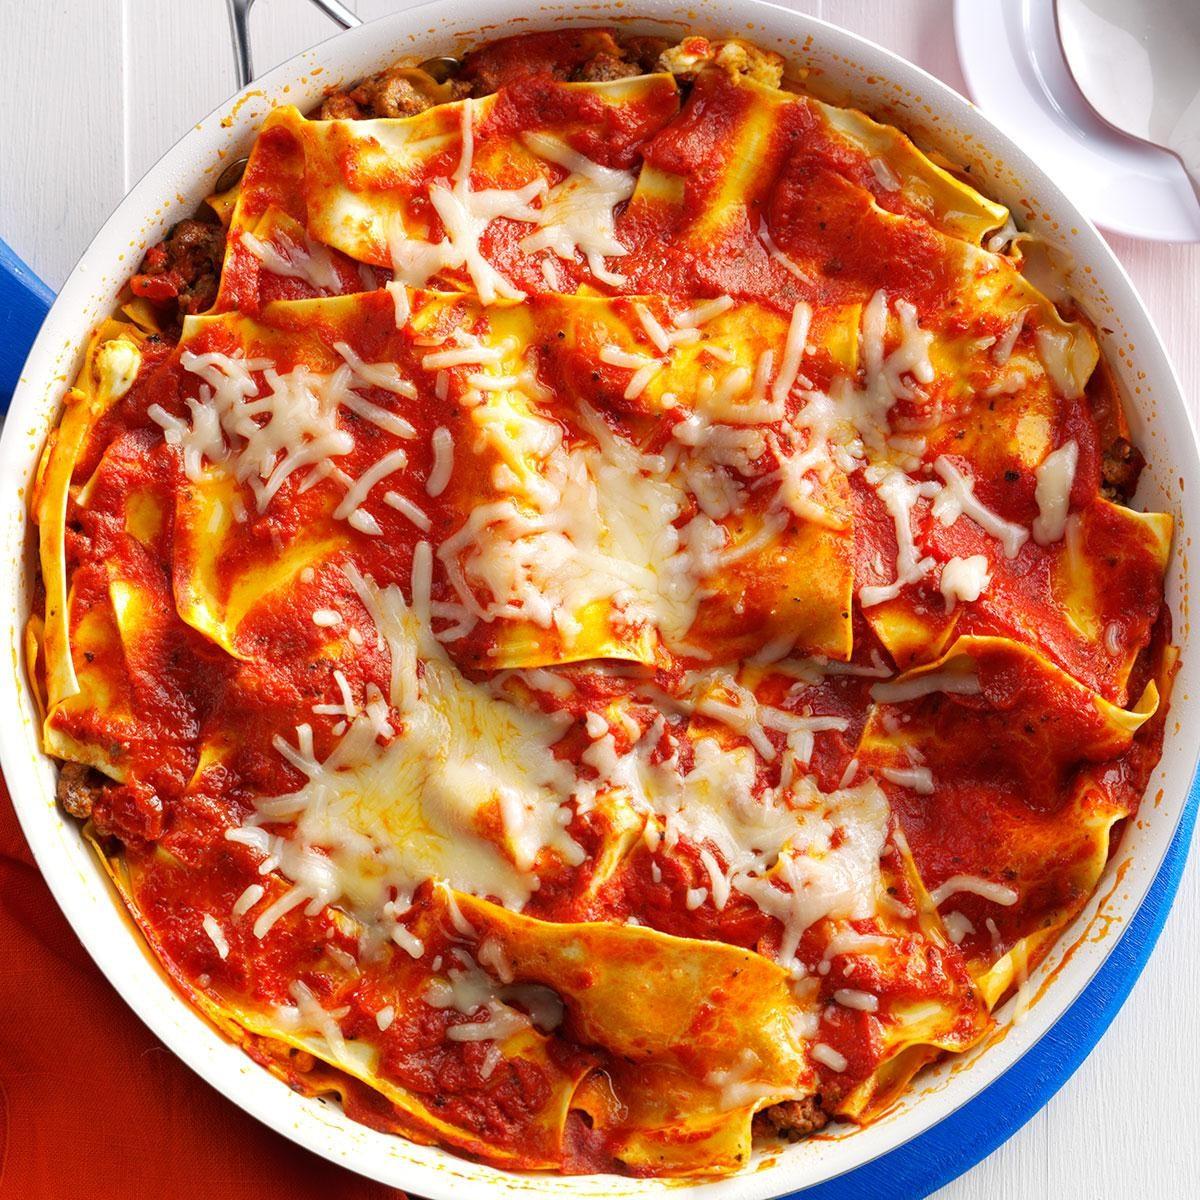 saucy skillet lasagna recipe | taste of home